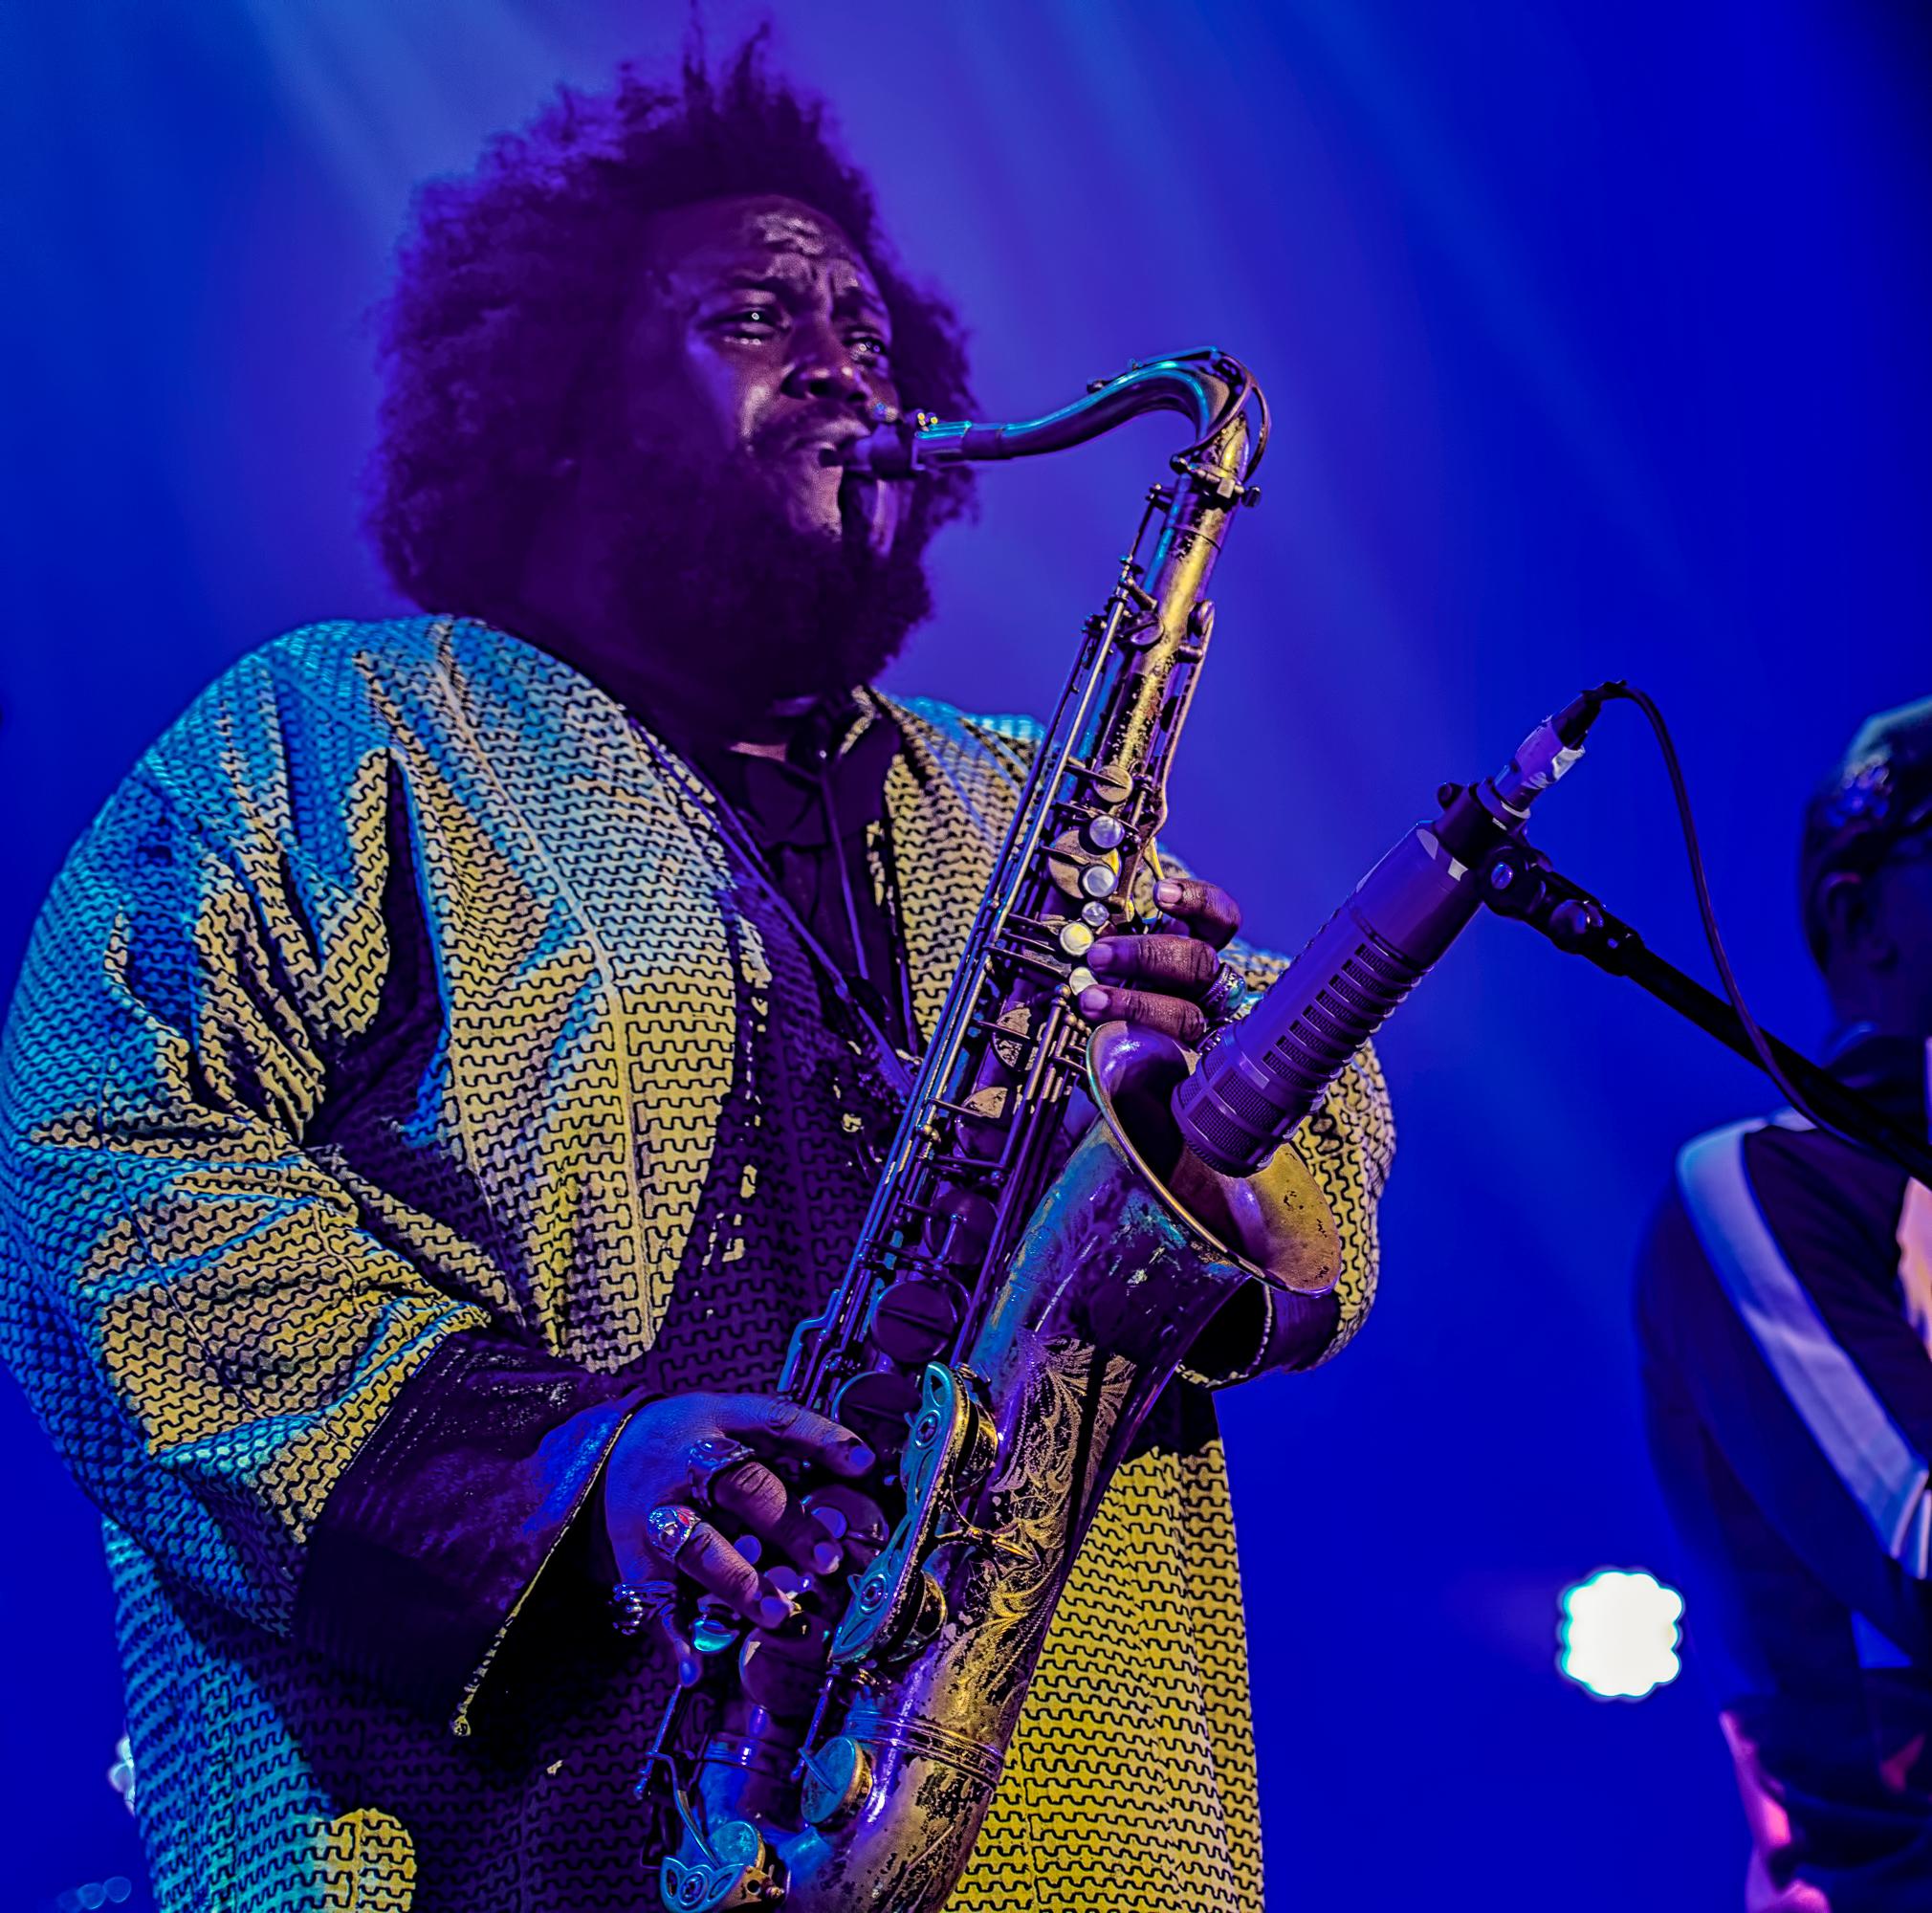 Kamasi Washington at the Montreal International Jazz Festival 2018